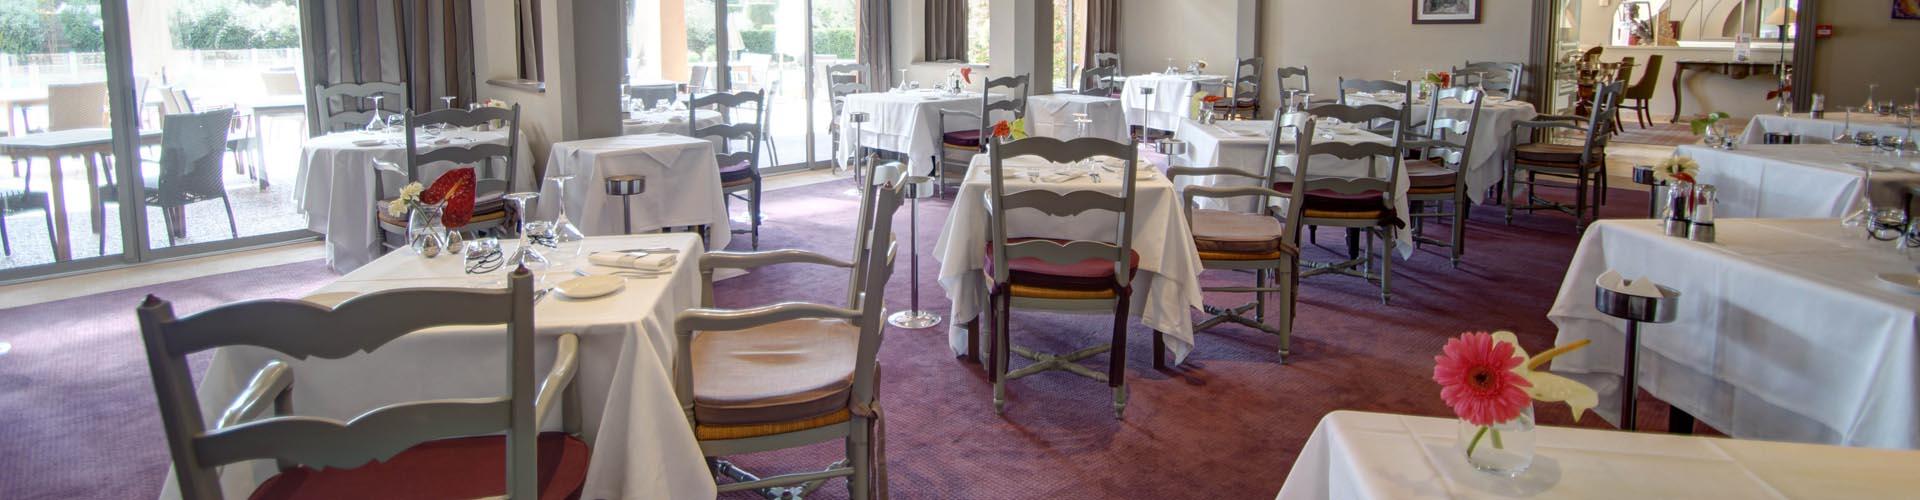 restaurant pinsparasols boulogne